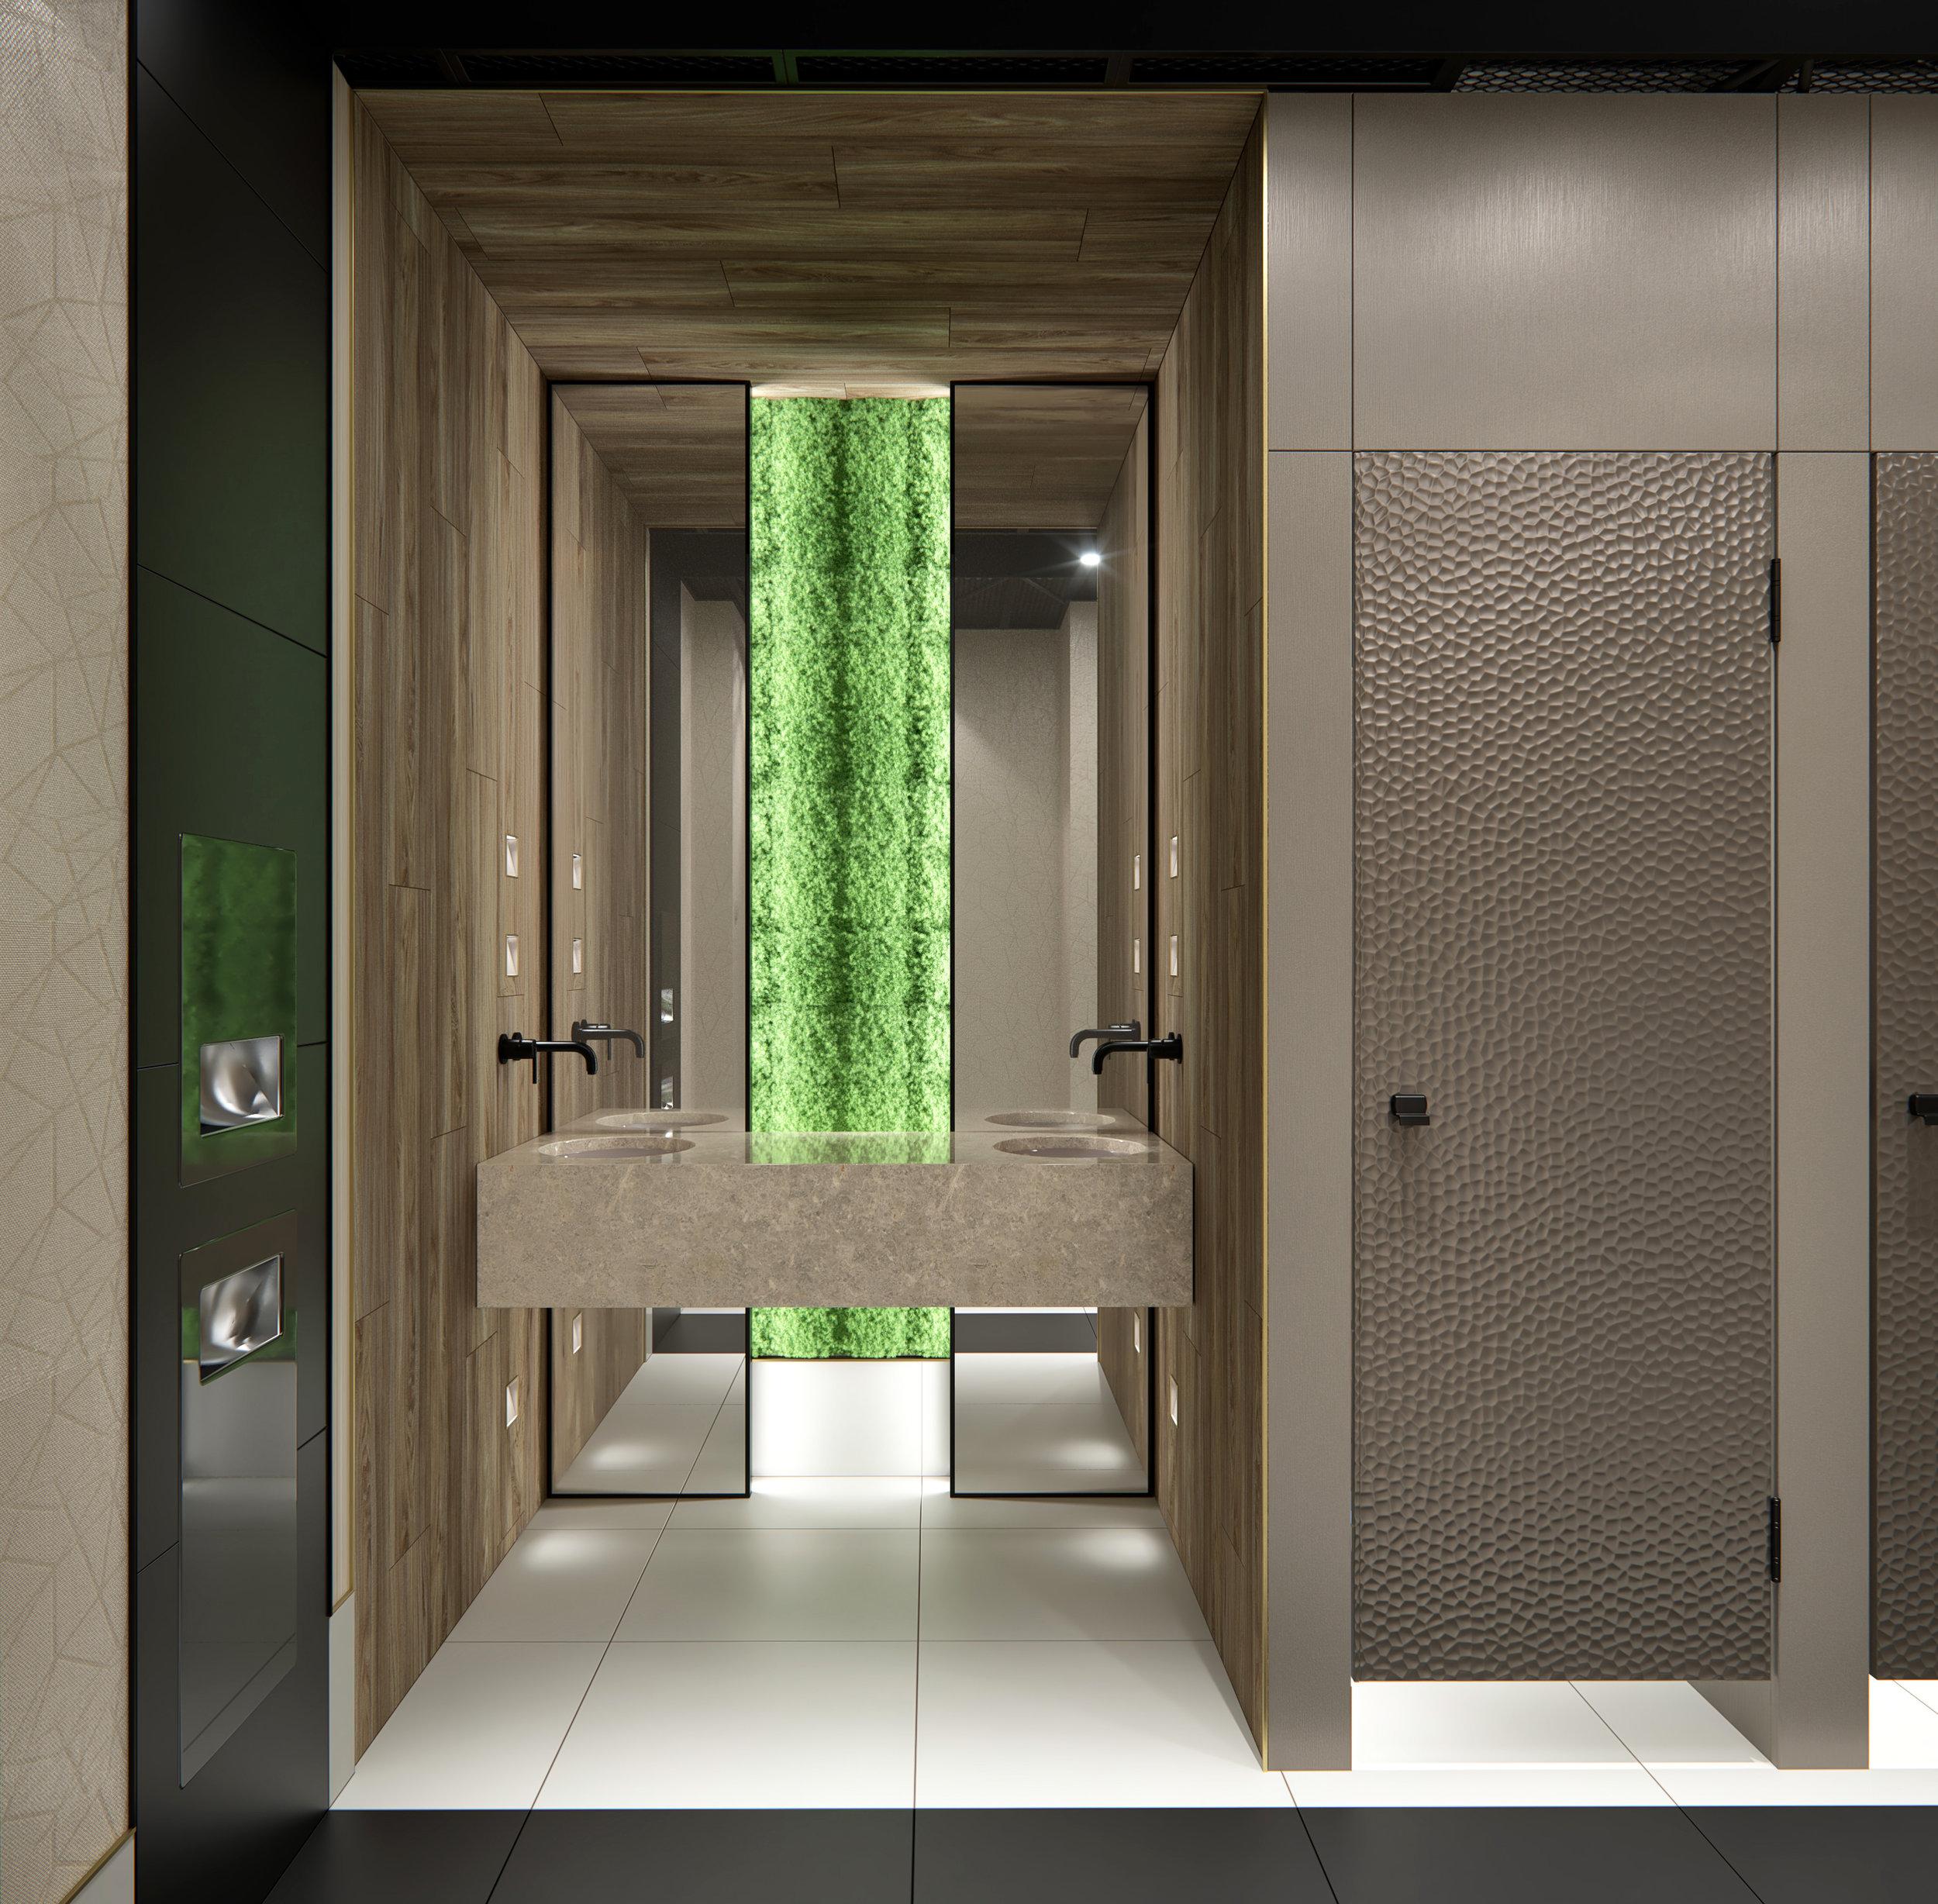 420 5TH AVENUE PUBLIC BATHROOM - MEN - 3.jpg